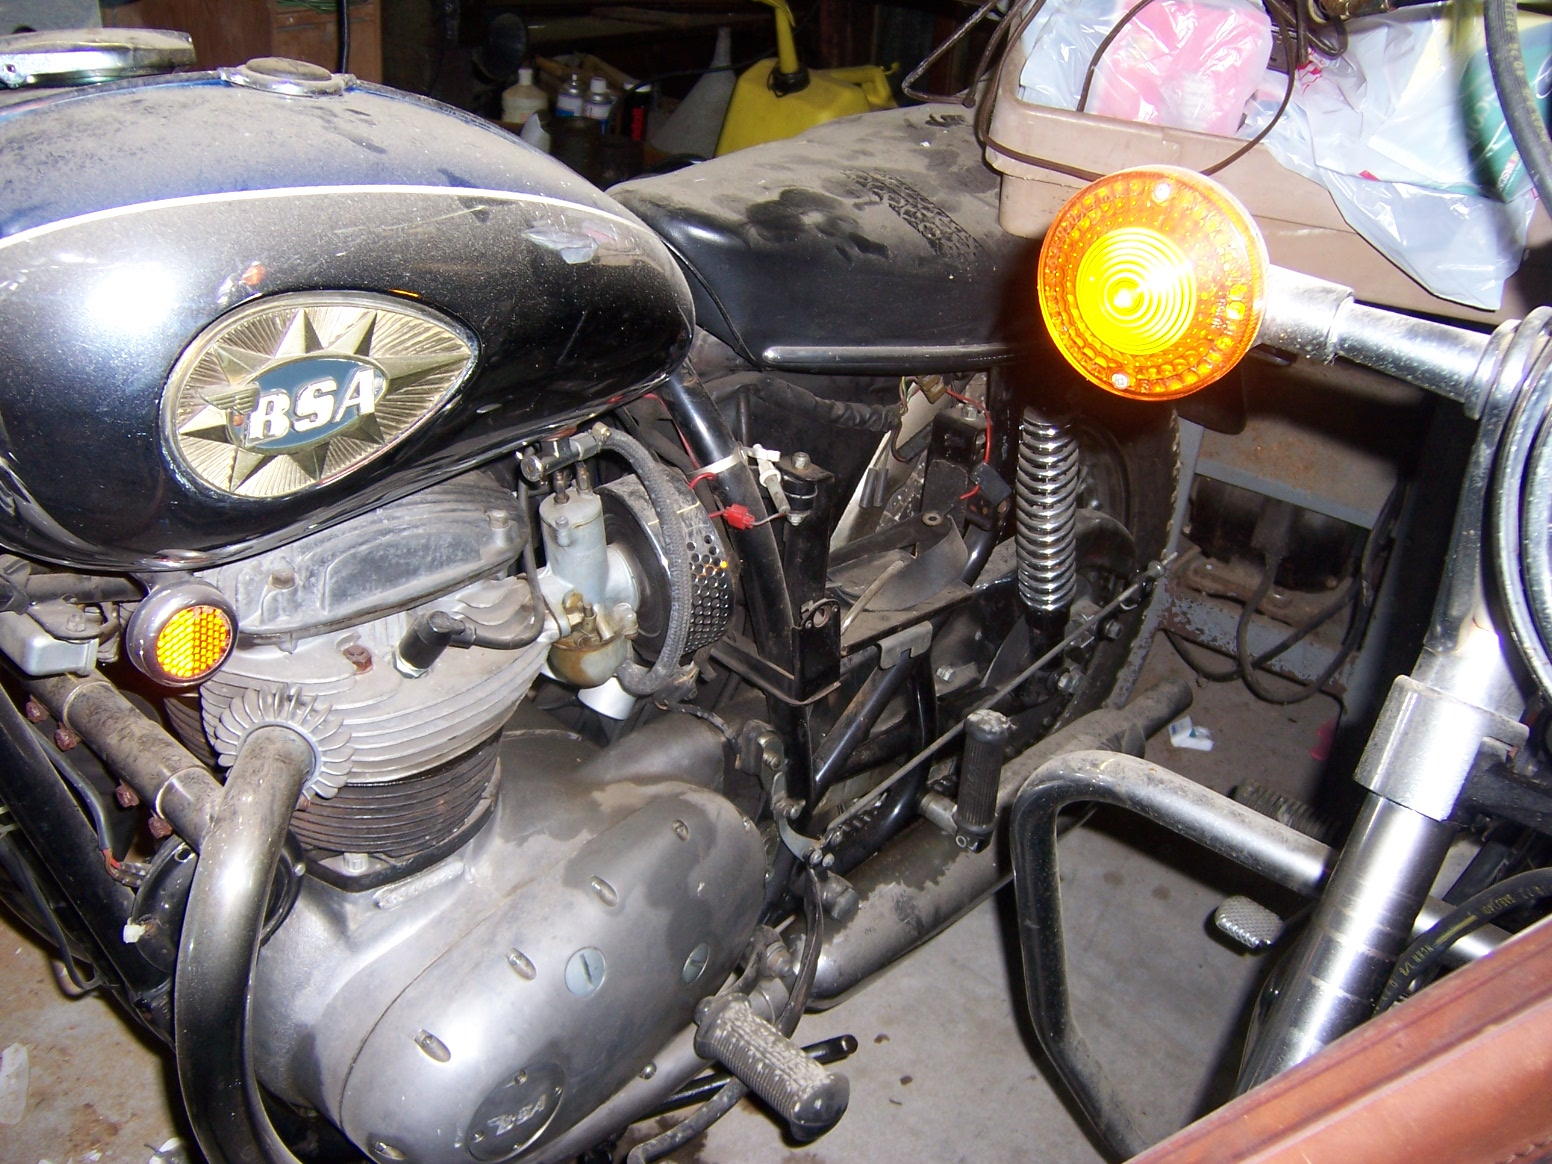 keeping the rockers rolling 1970 bsa lightning rh keepingtherockersrolling blogspot com suzuki atv wiring diagrams suzuki [ 1552 x 1164 Pixel ]